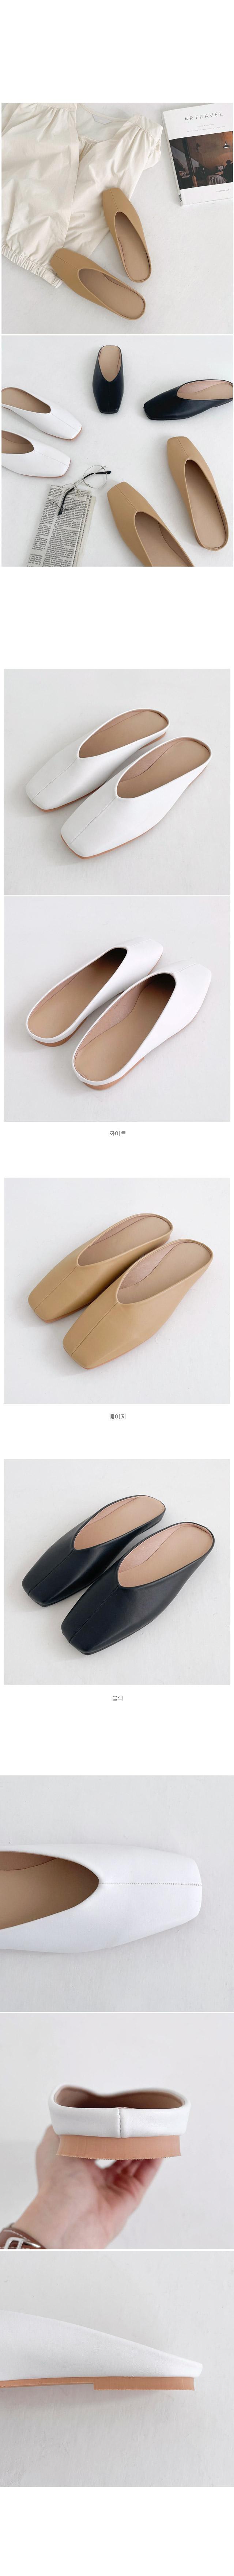 Nicole blower shoes